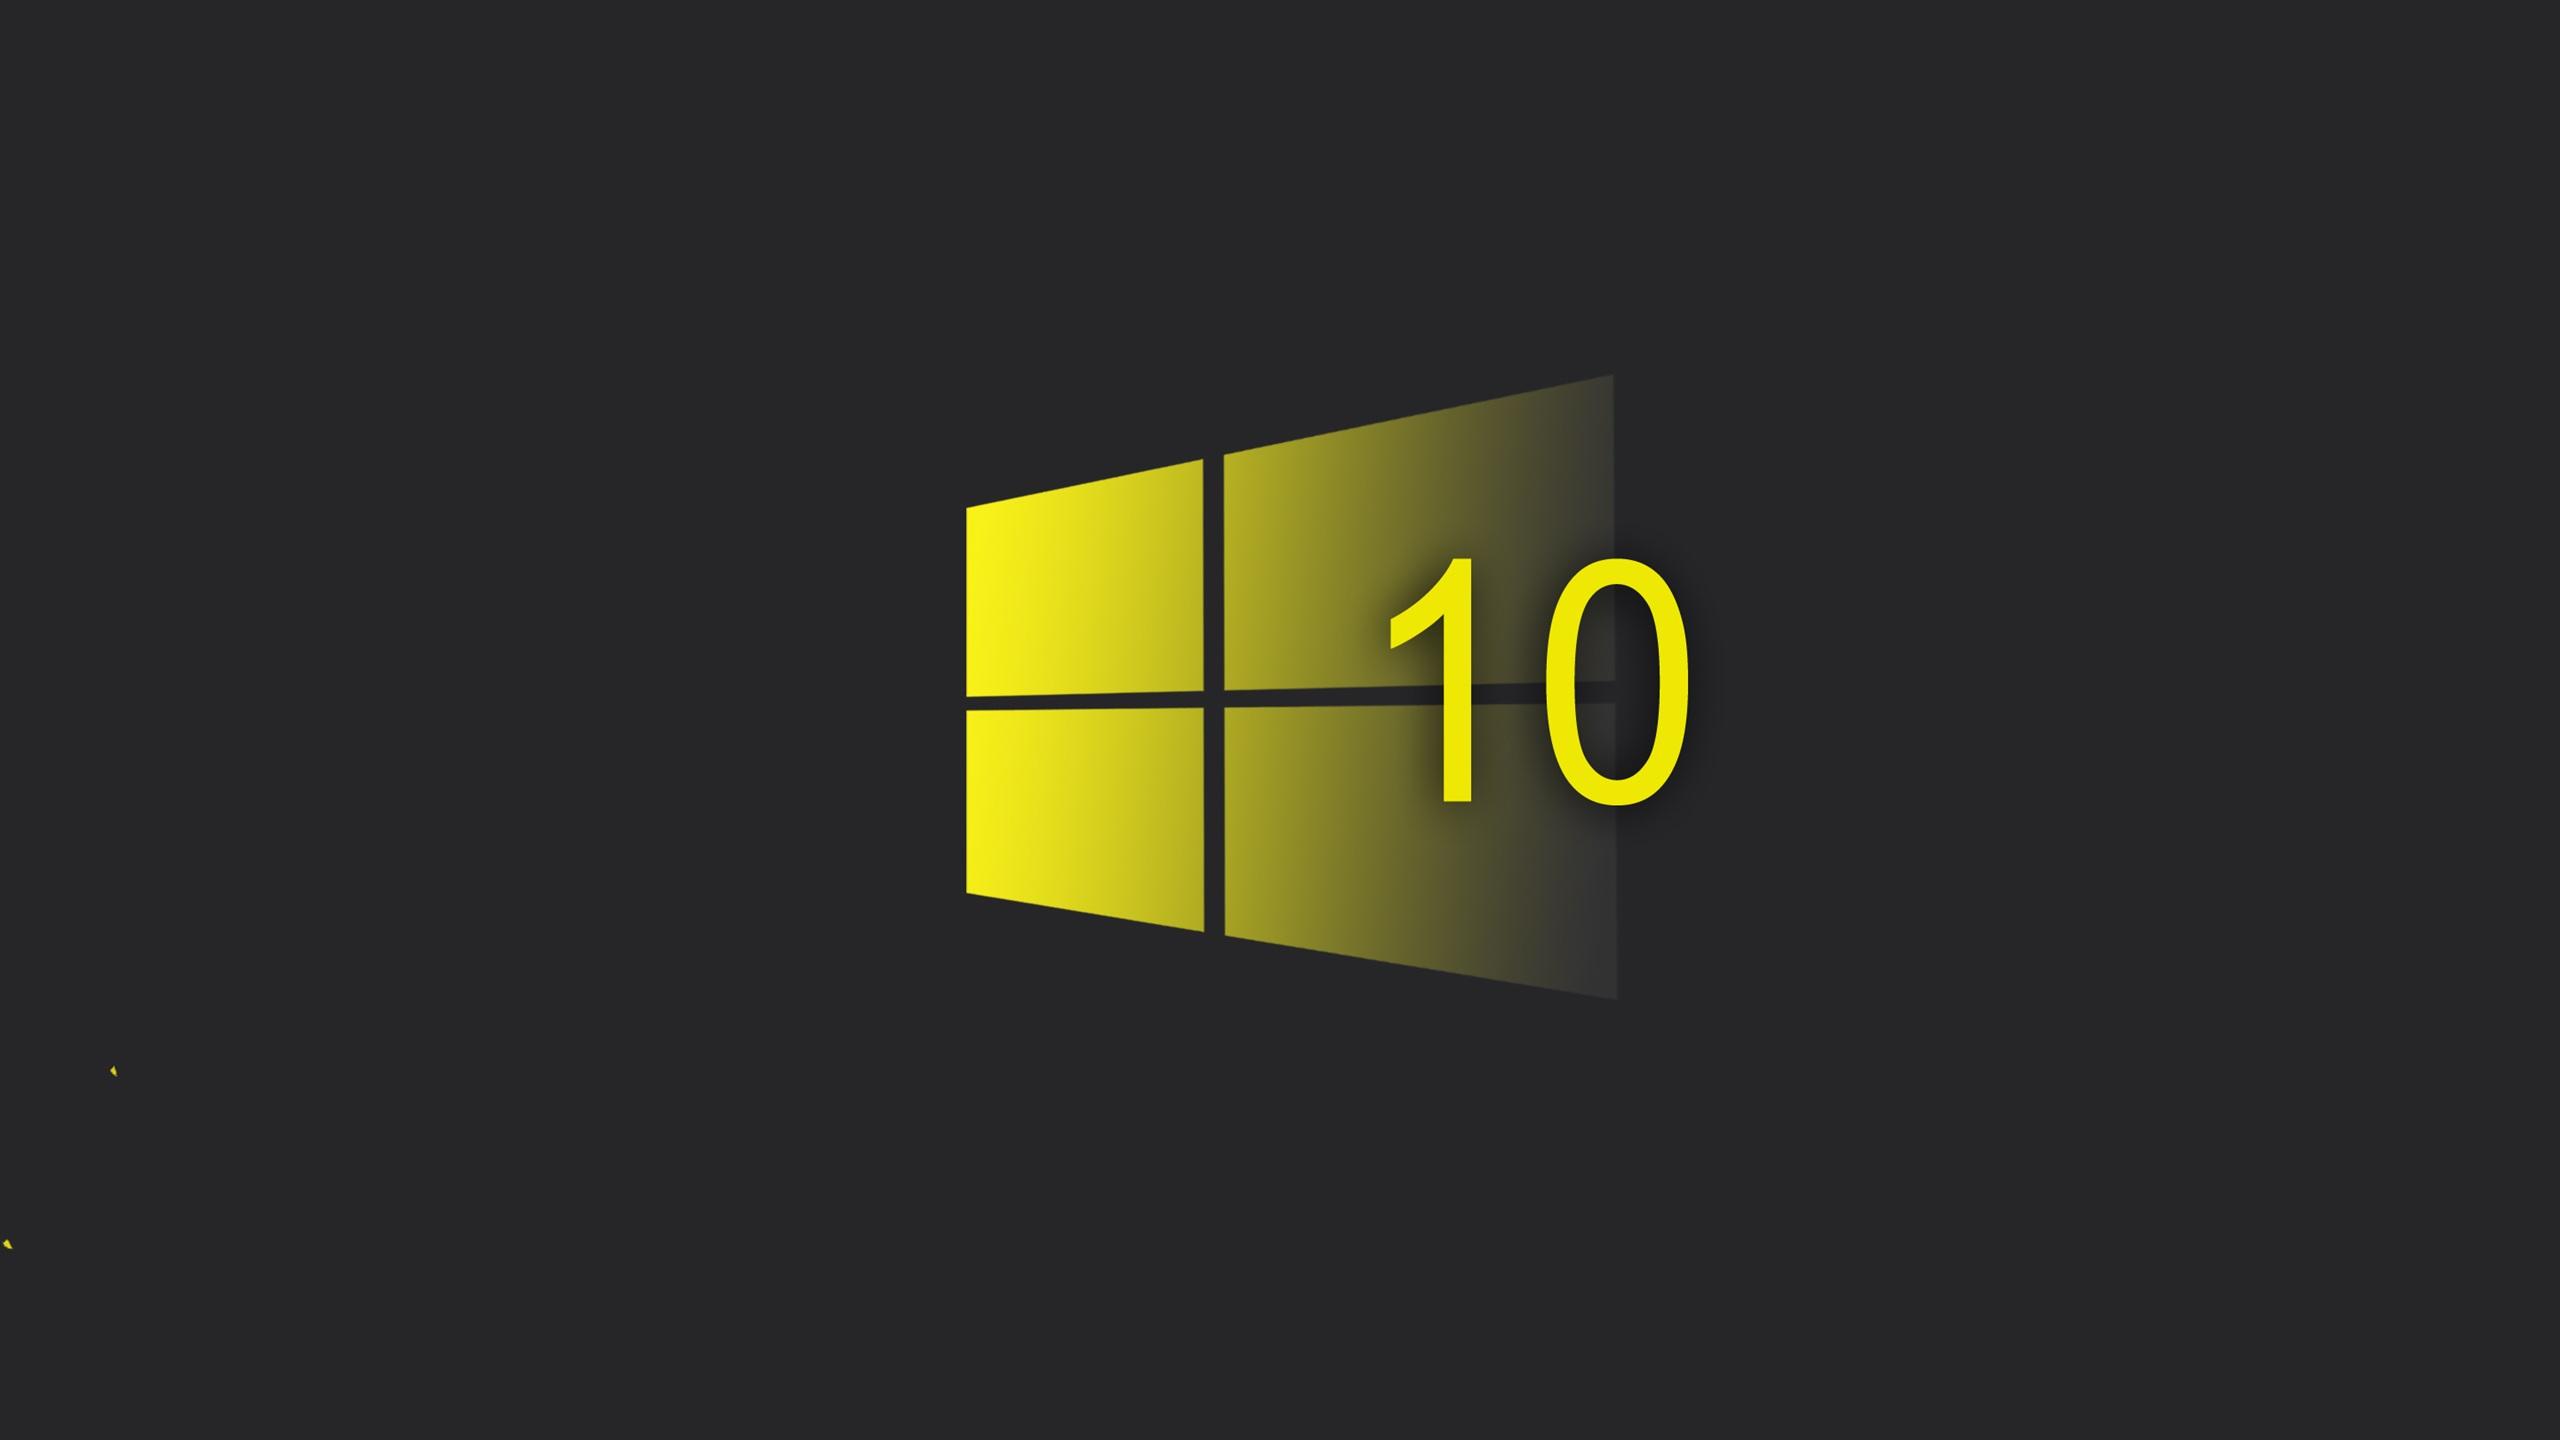 Windows 10 System Yellow Style Logo Black Background